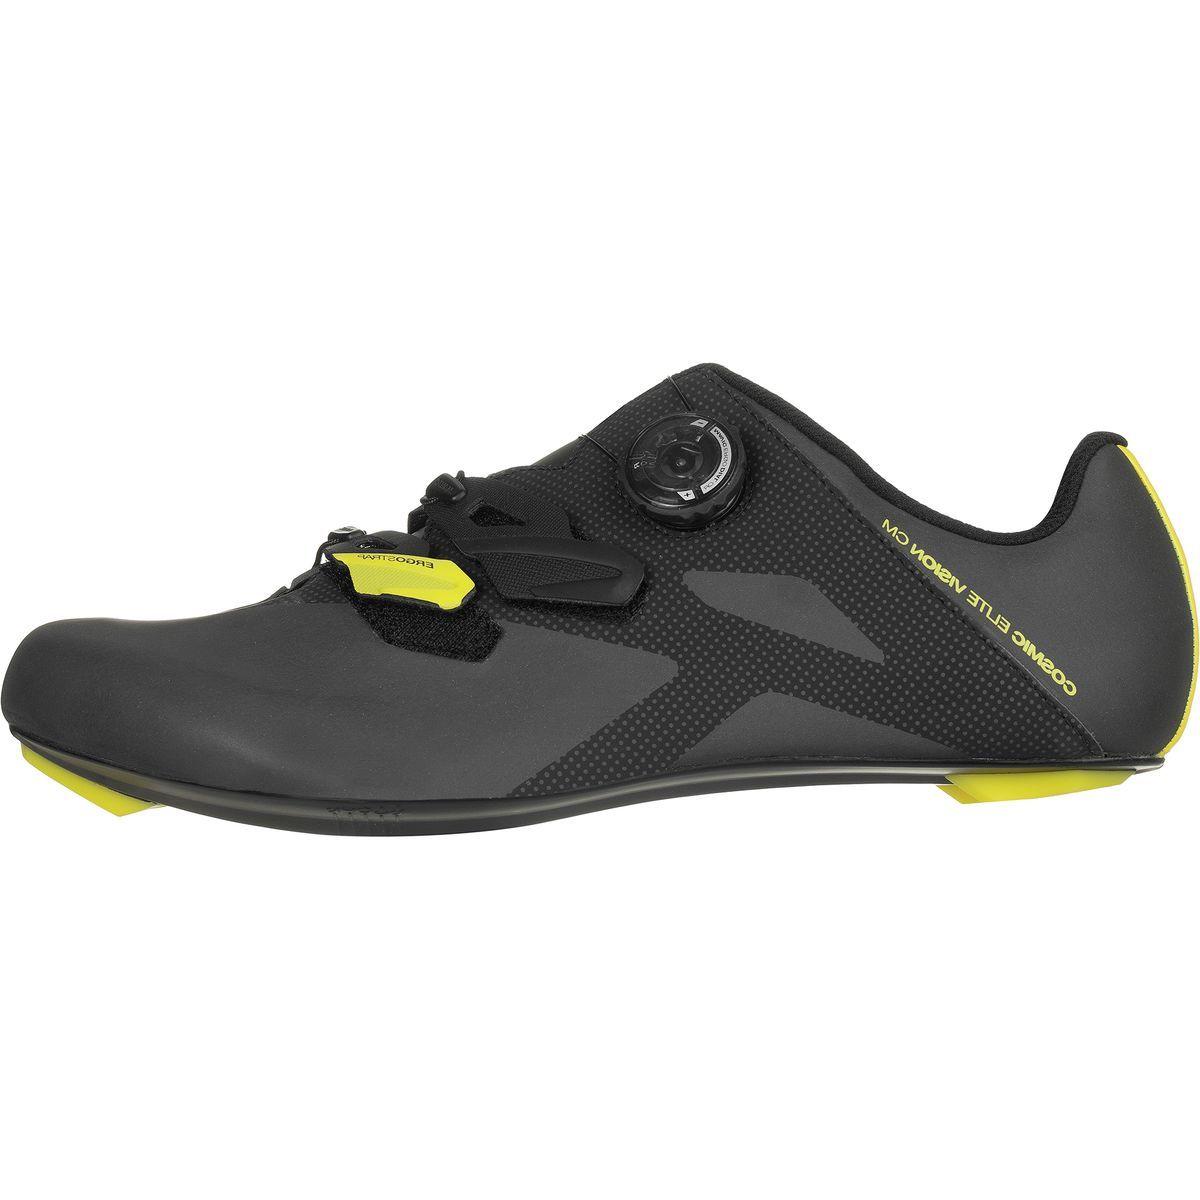 Mavic Cosmic Elite Vision CM Cycling Shoe - Men's